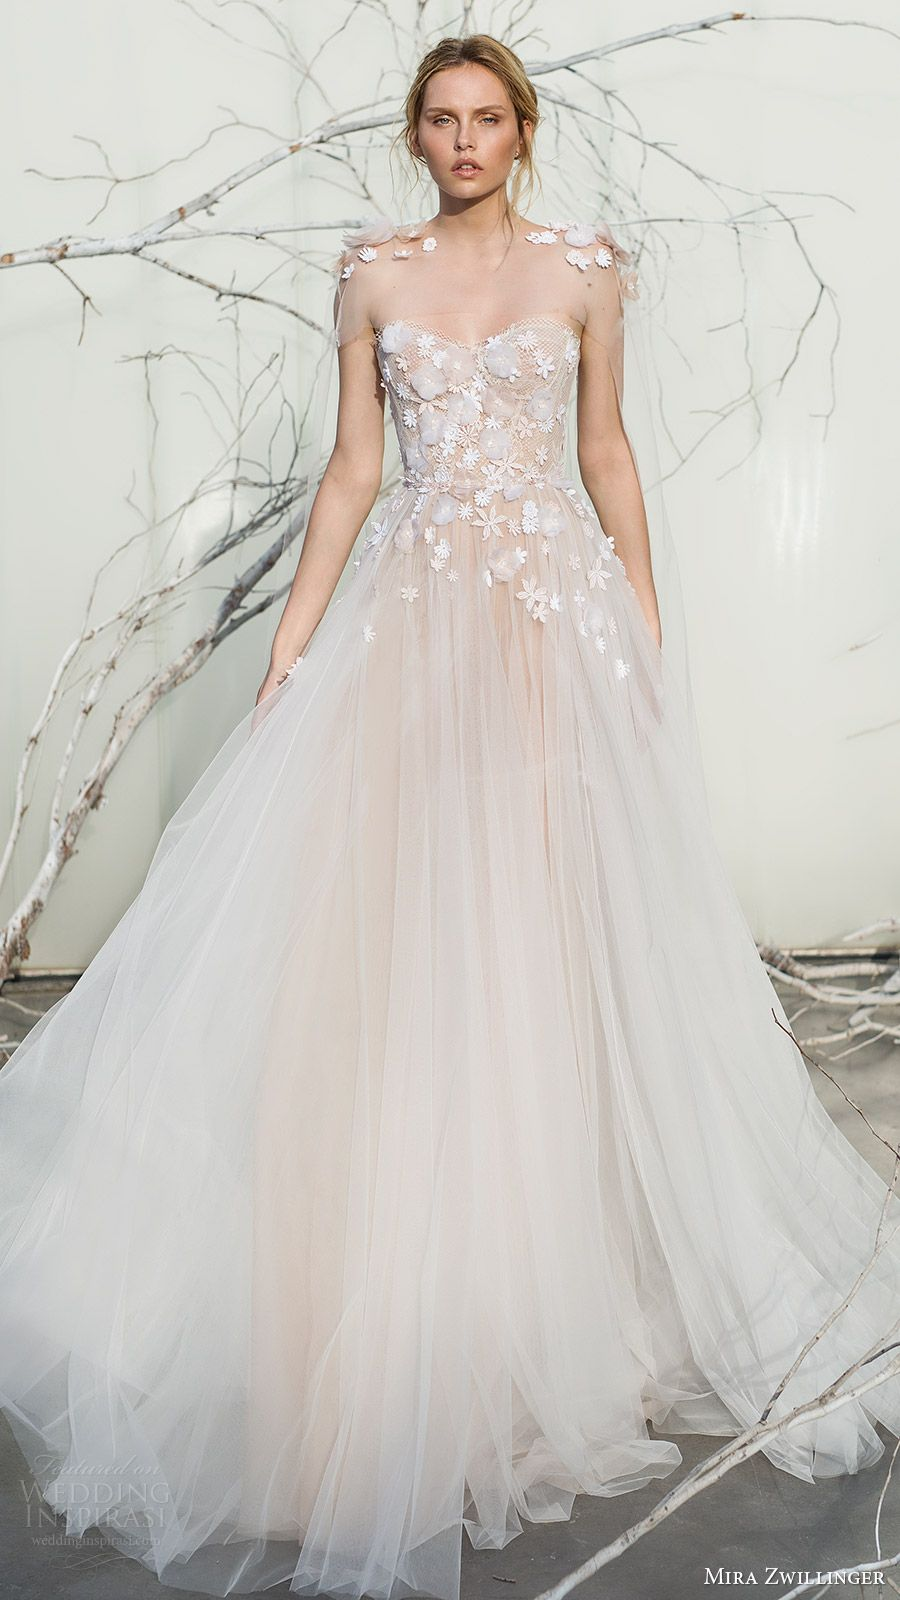 Mira zwillinger wedding dresses u ucwhisper of blossomud bridal